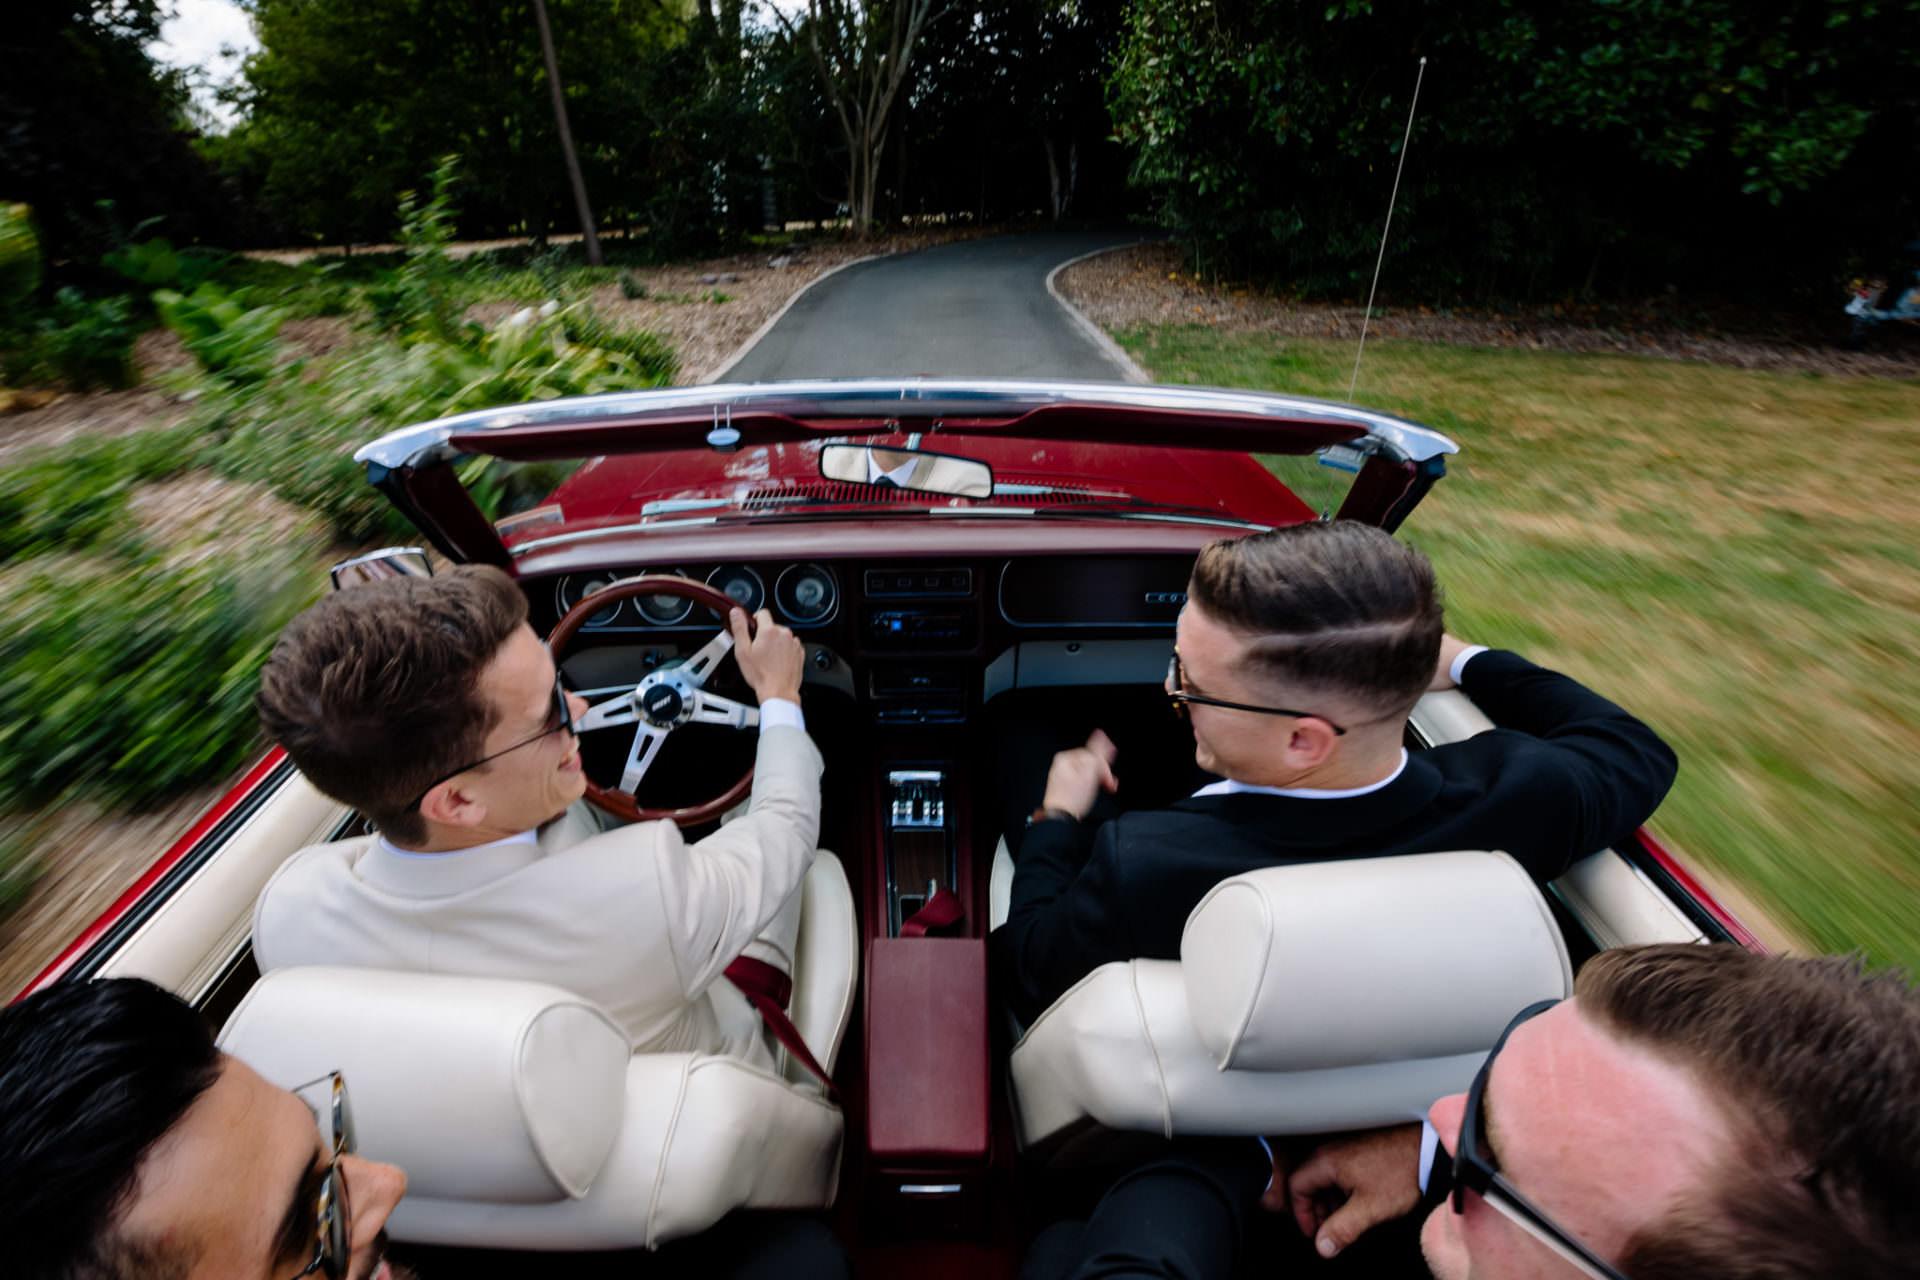 Bridal car with groomsman